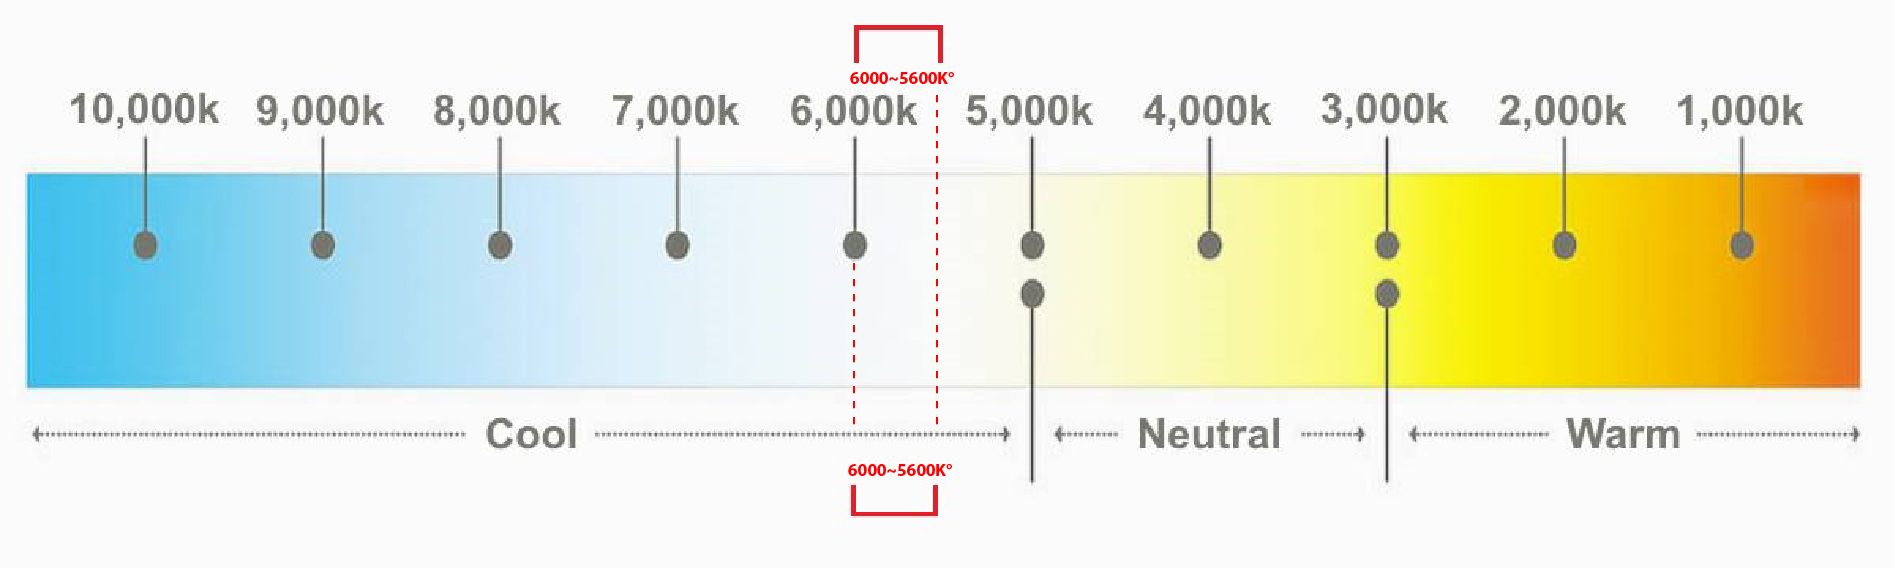 colour_temperature_chart_